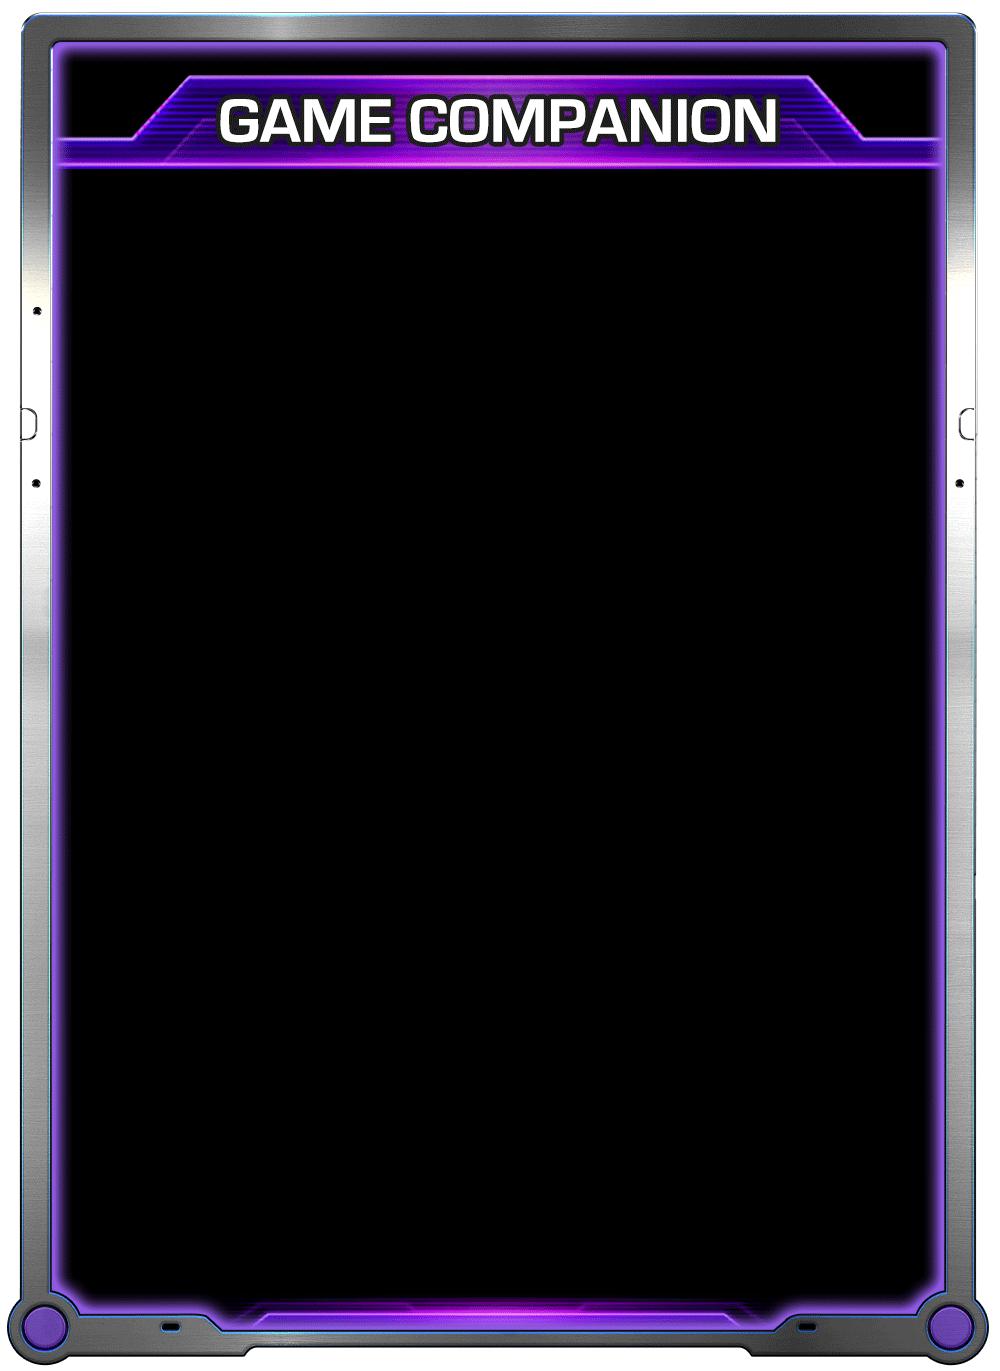 Game-Companion-Frame.png